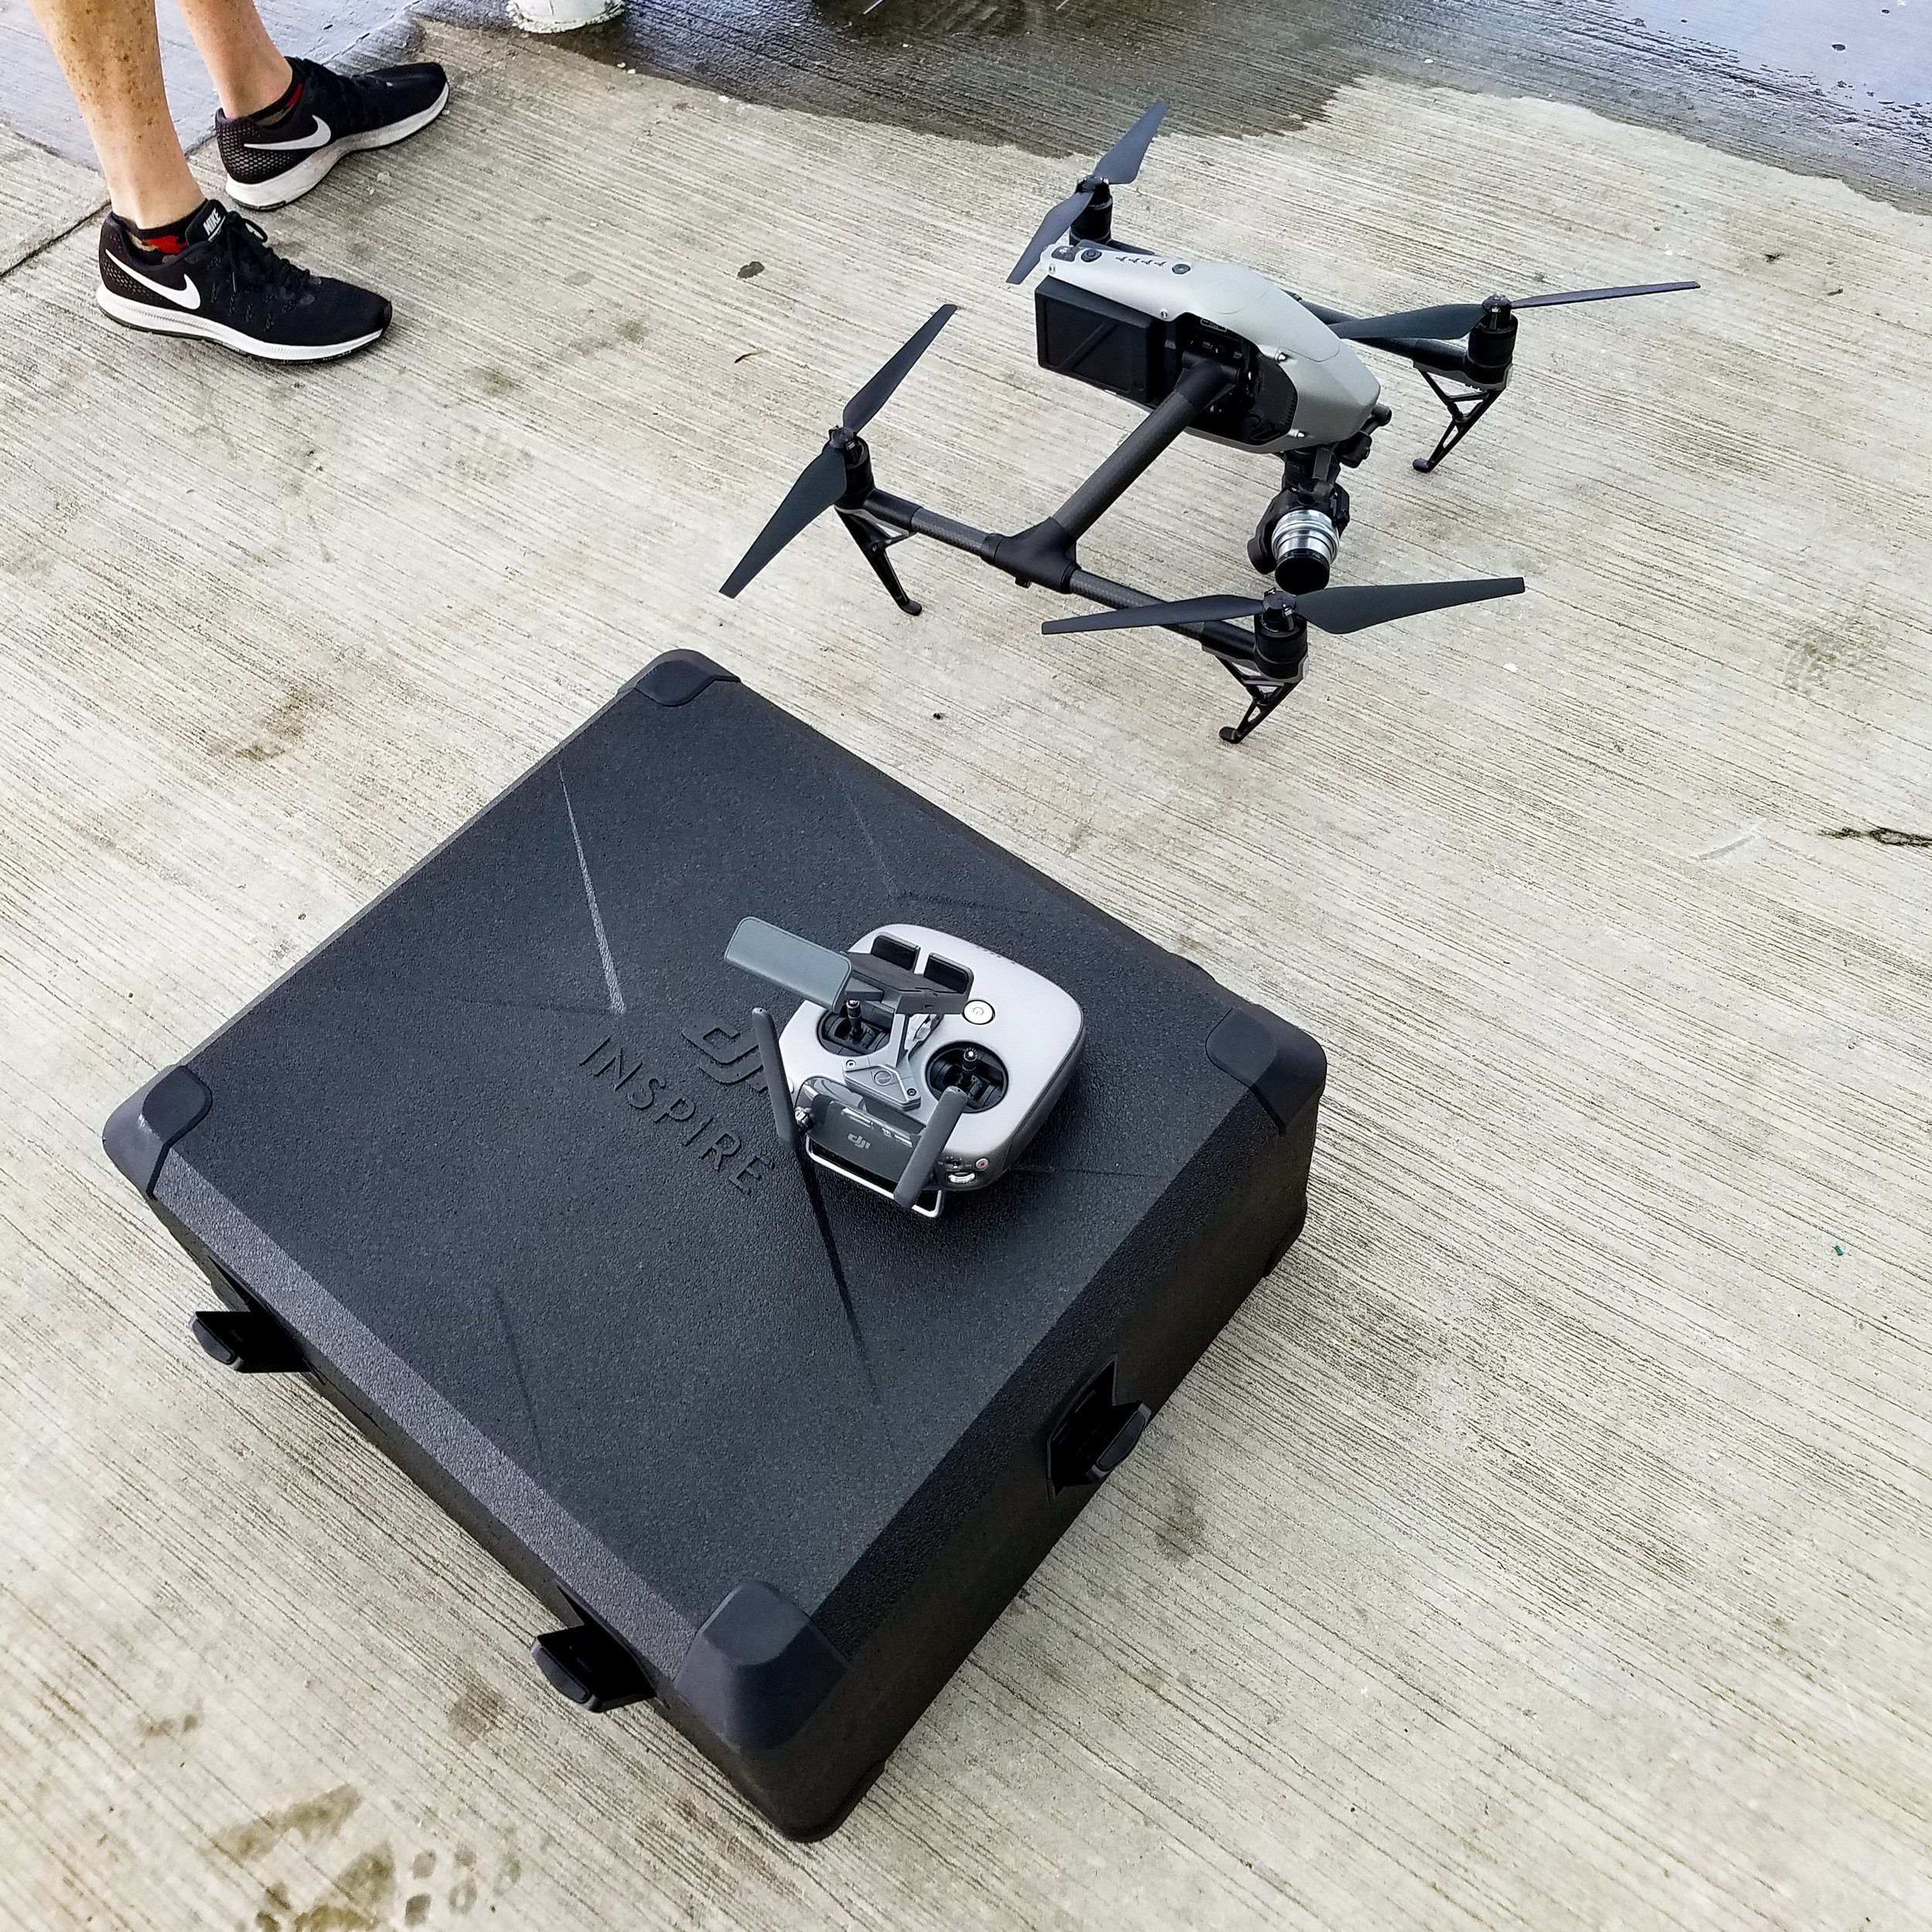 Drone20180507_160033.jpg